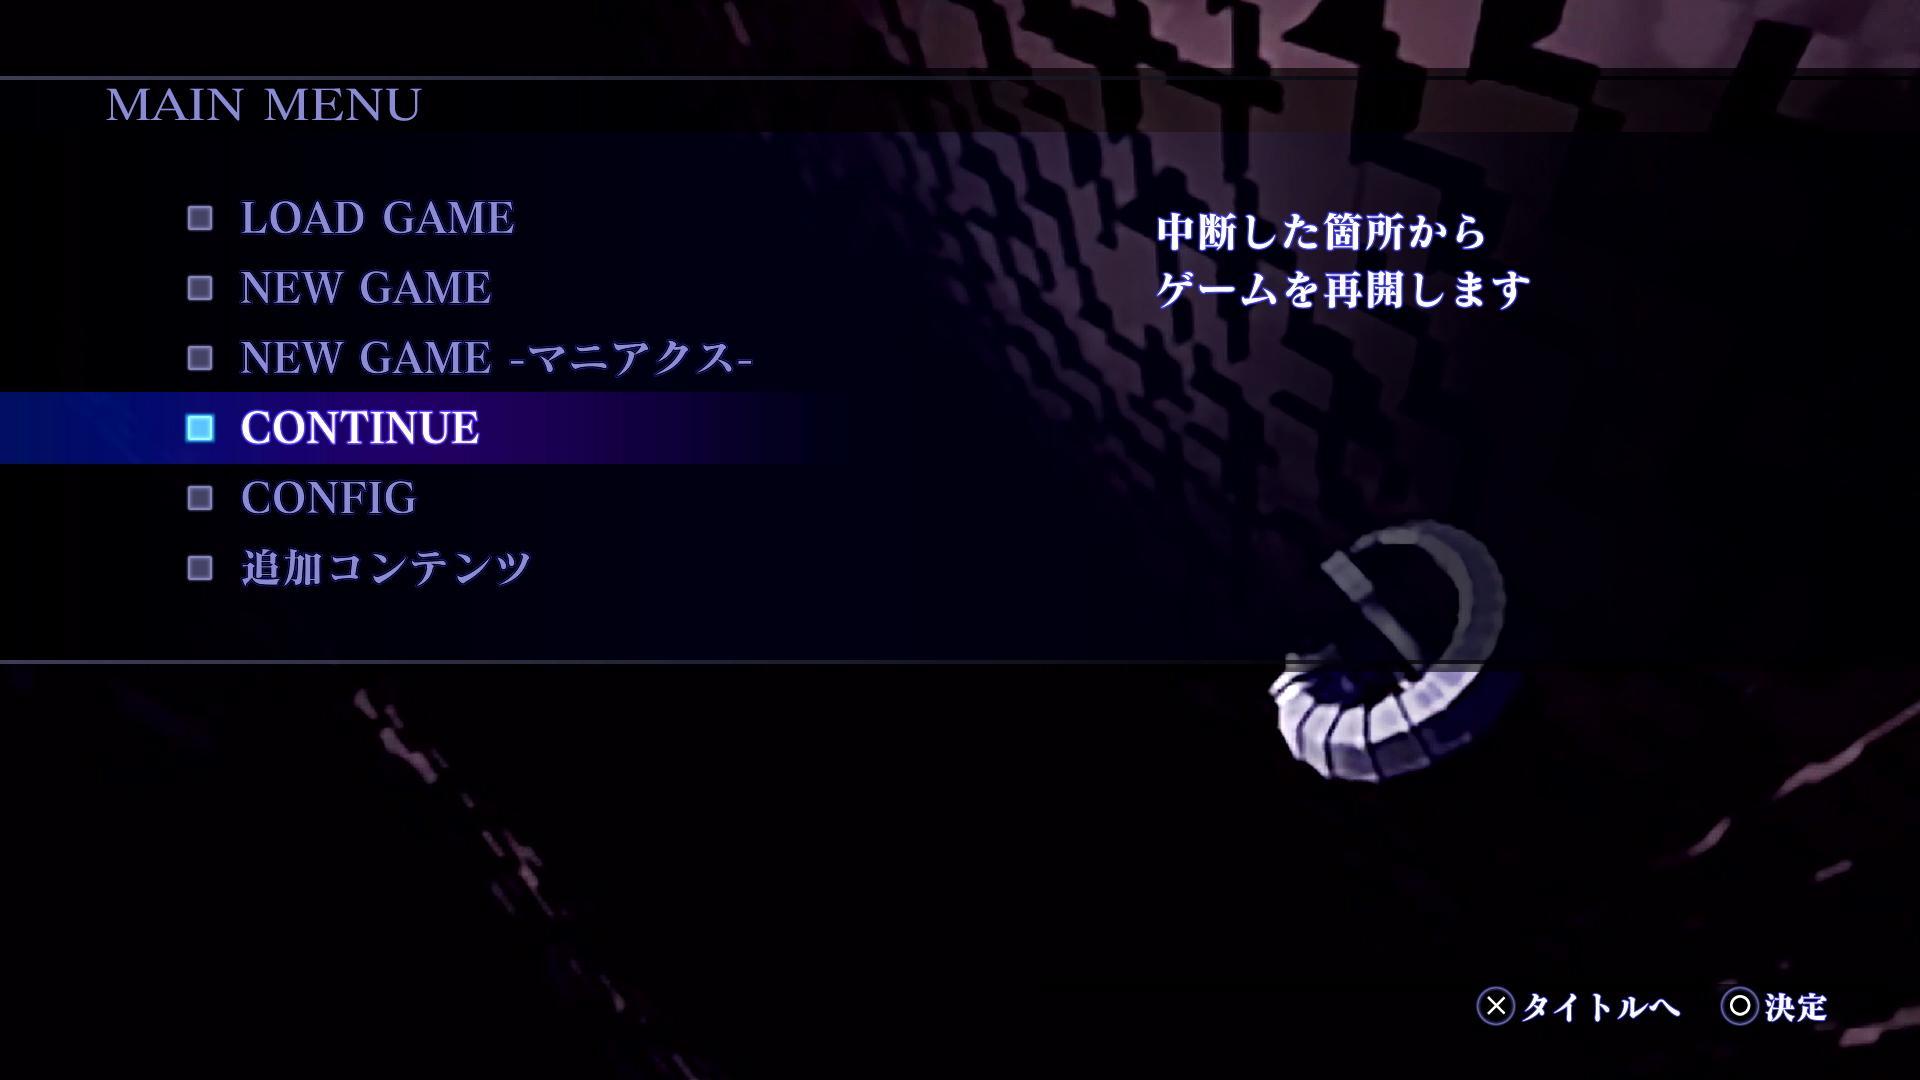 Re: [問題] 女神轉生3 是否推薦